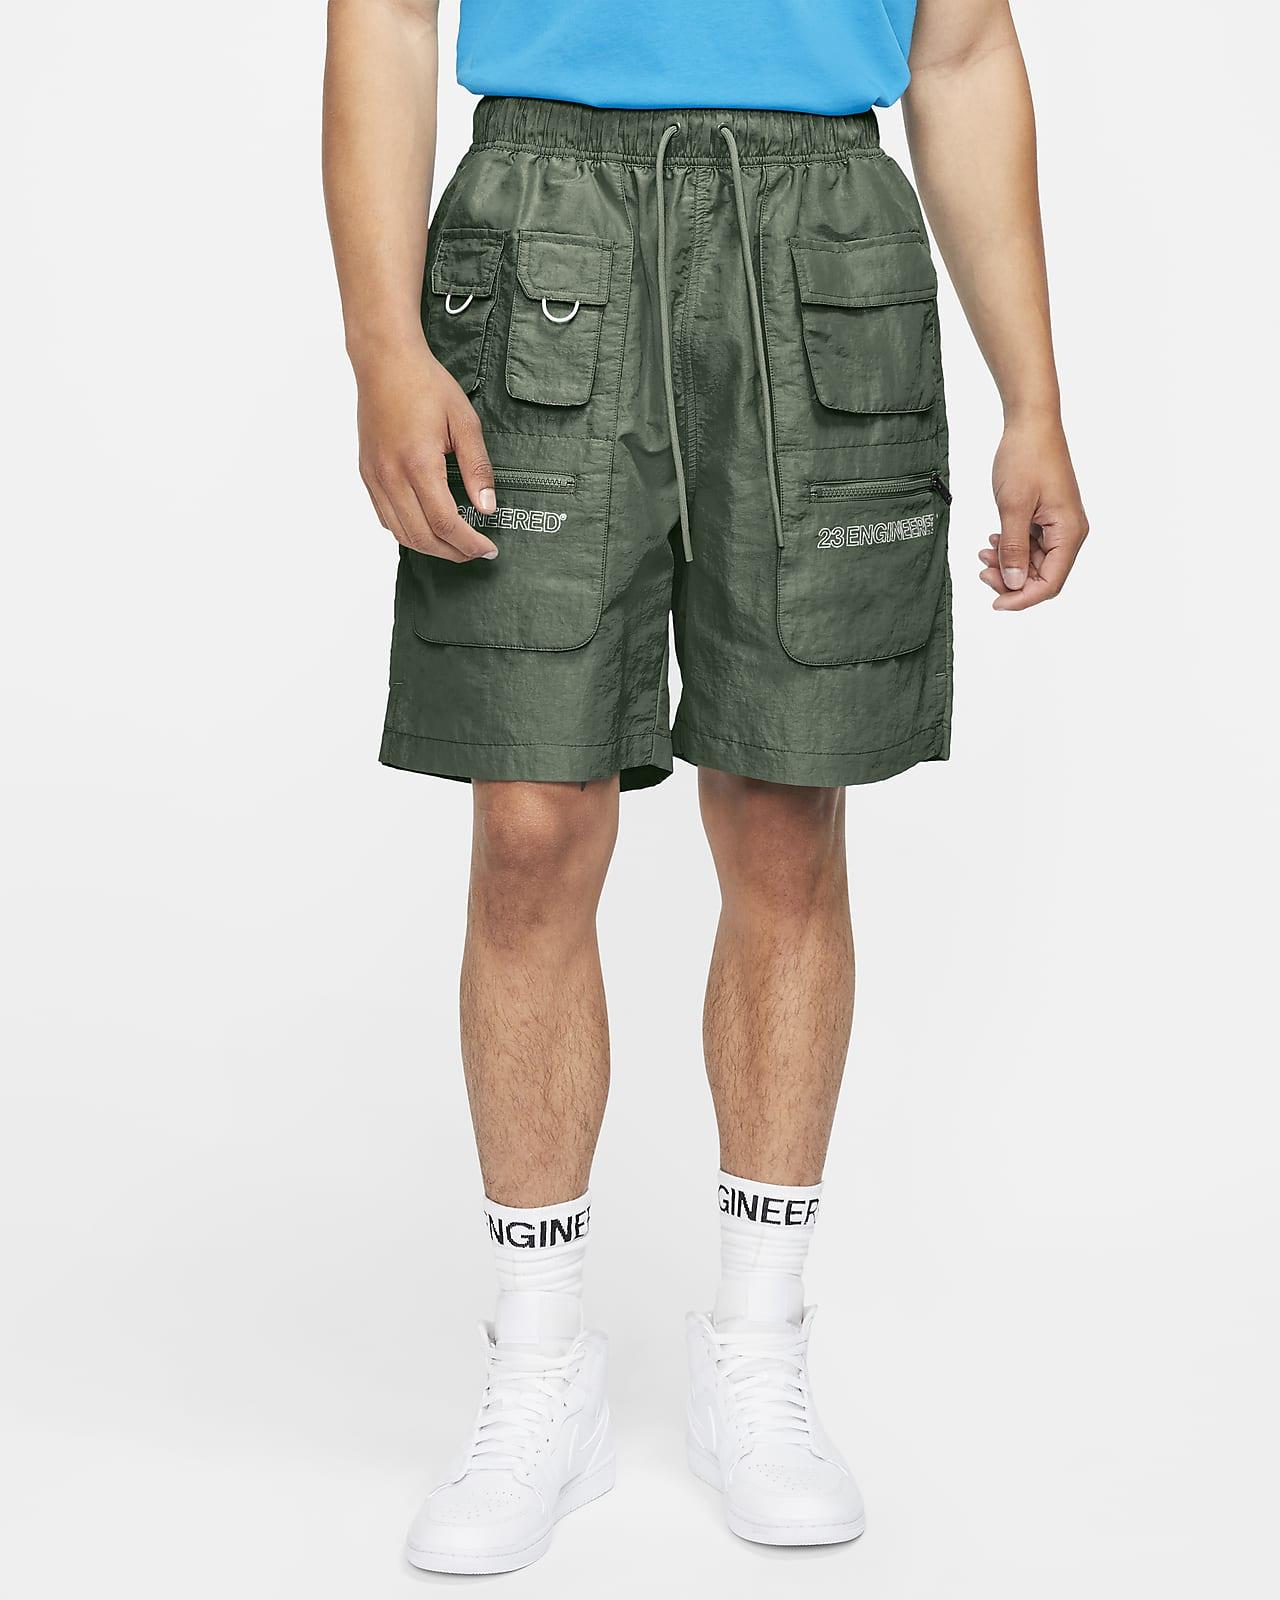 Jordan 23 Engineered Pantalón corto funcional - Hombre